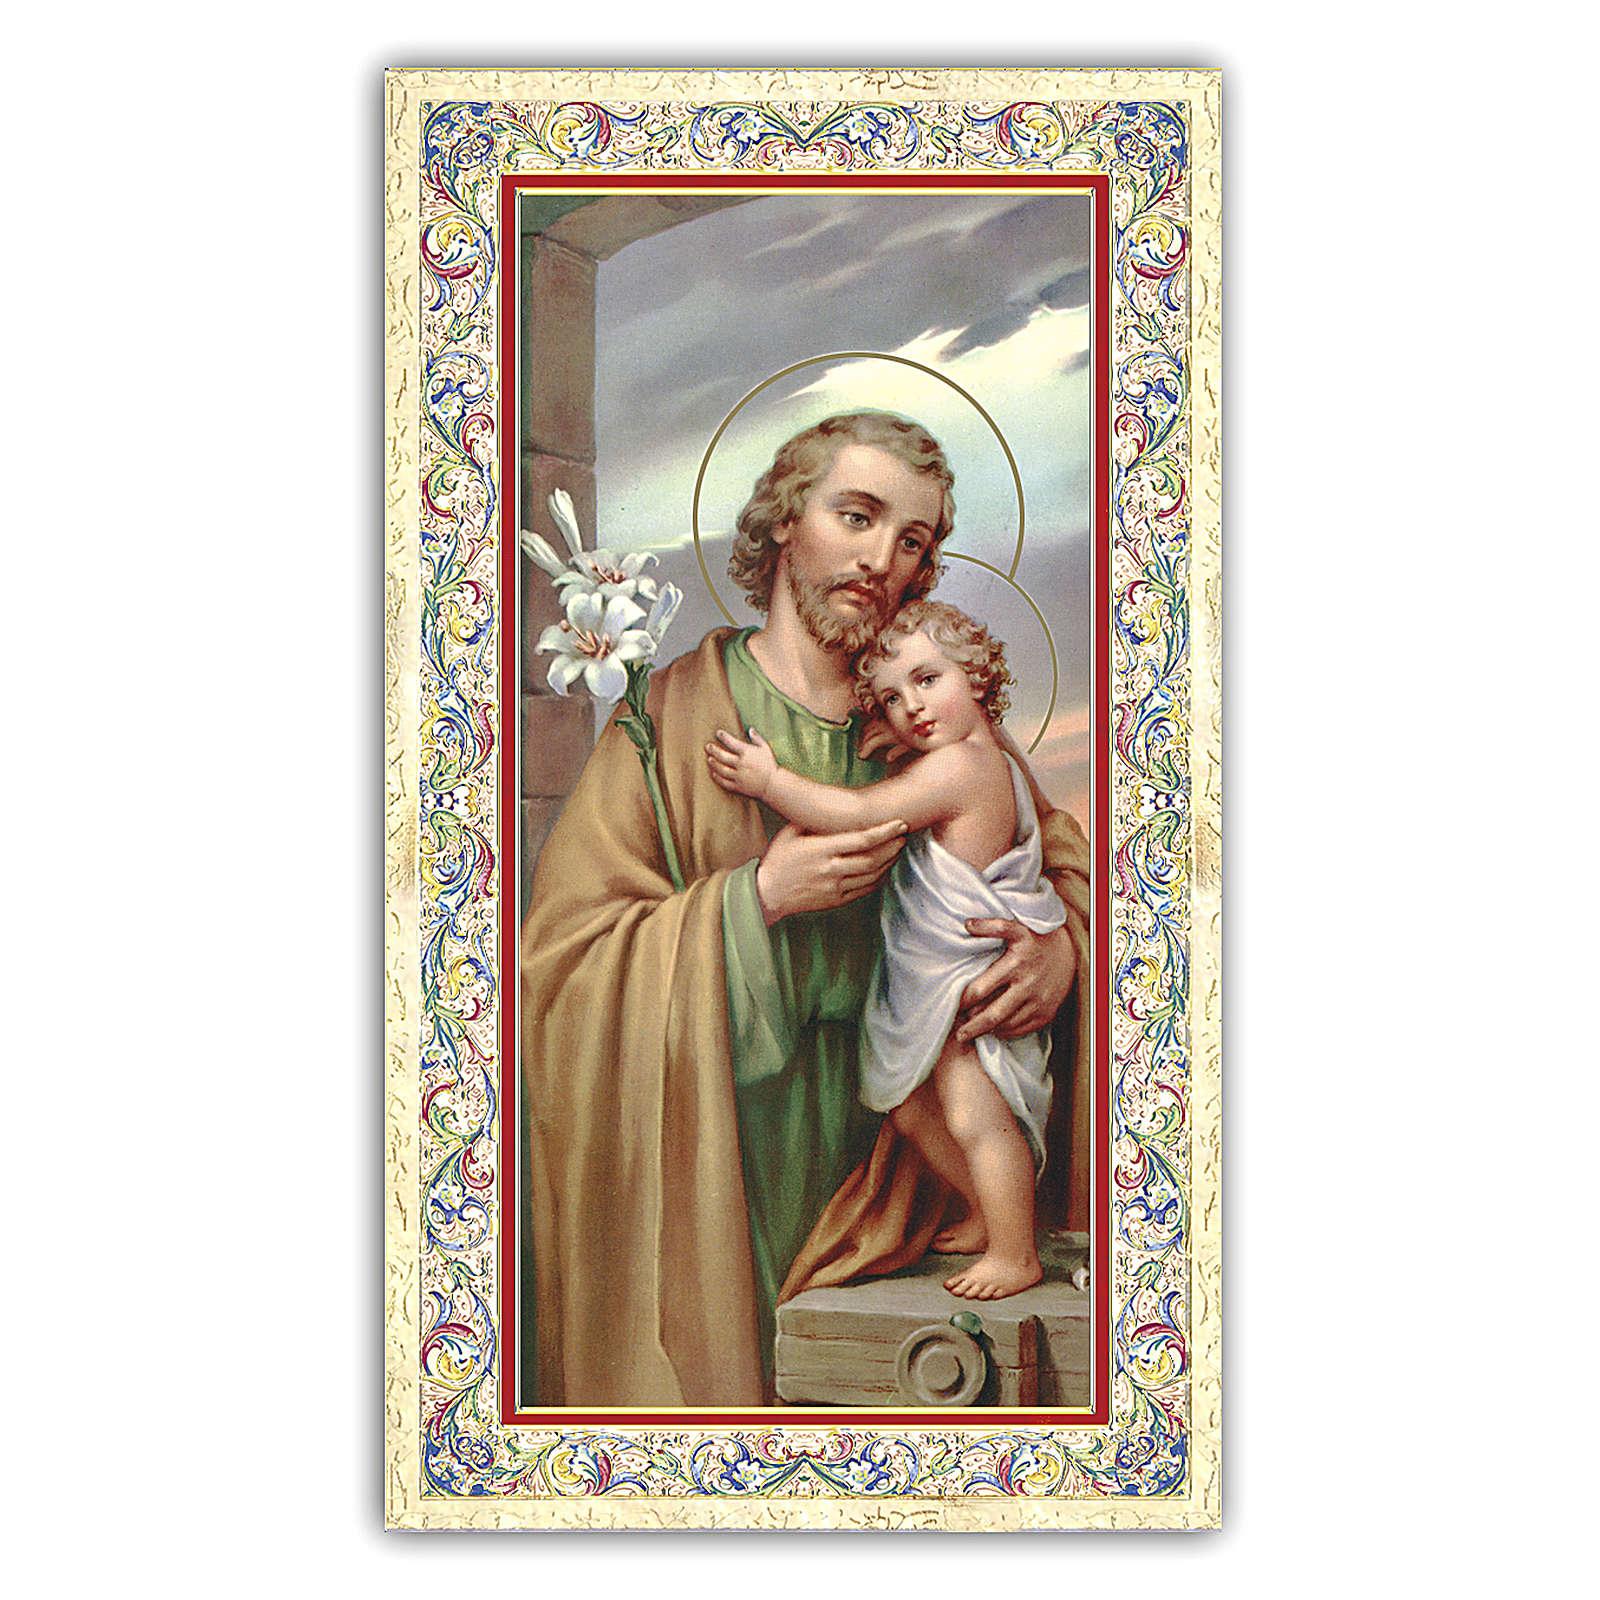 Santino San Giuseppe che abbraccia il Bambino Gesù 10x5 cm ITA 4